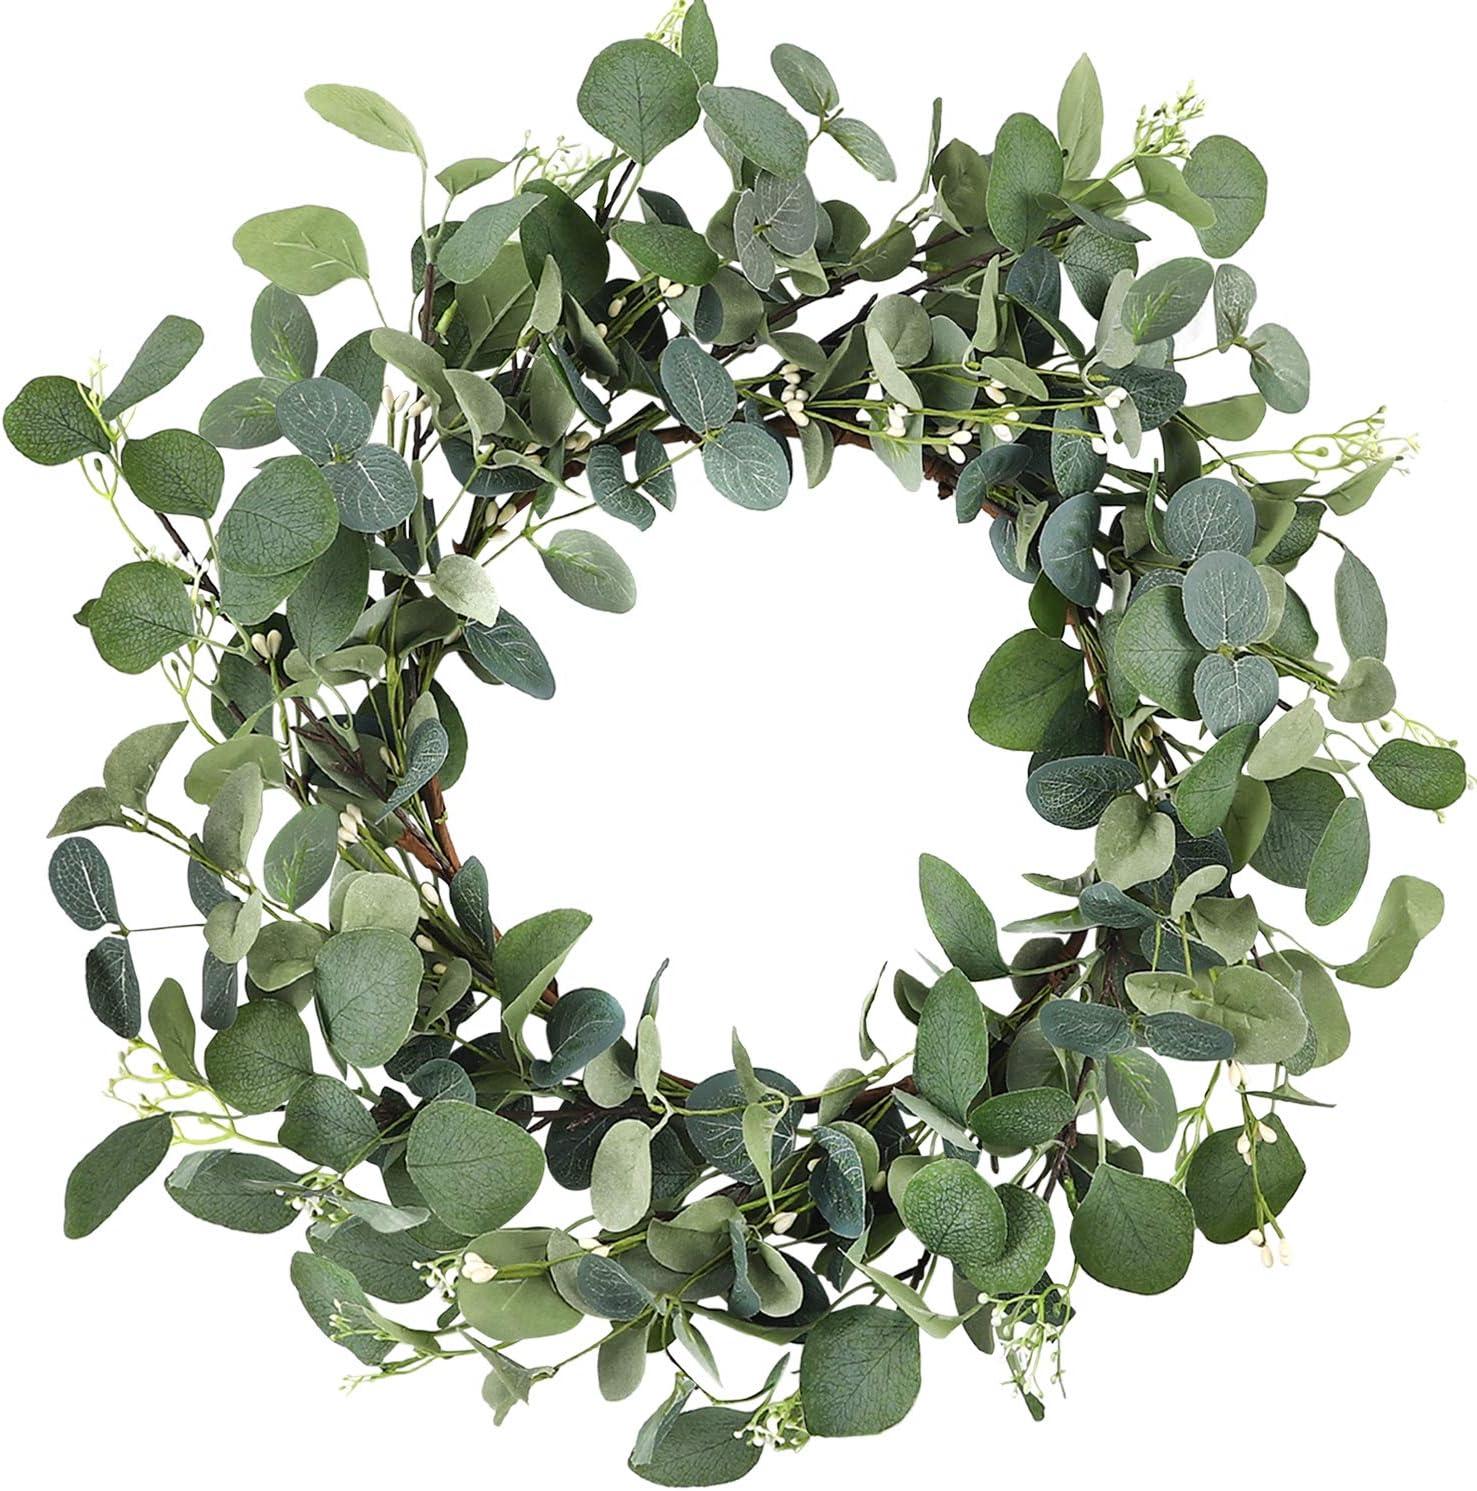 CEWOR 19 Inches Artificial Green Leaf Eucalyptus Wreath Spring Summer Outdoor Ornaments for Front Door Wall Window Farmhouse Decor